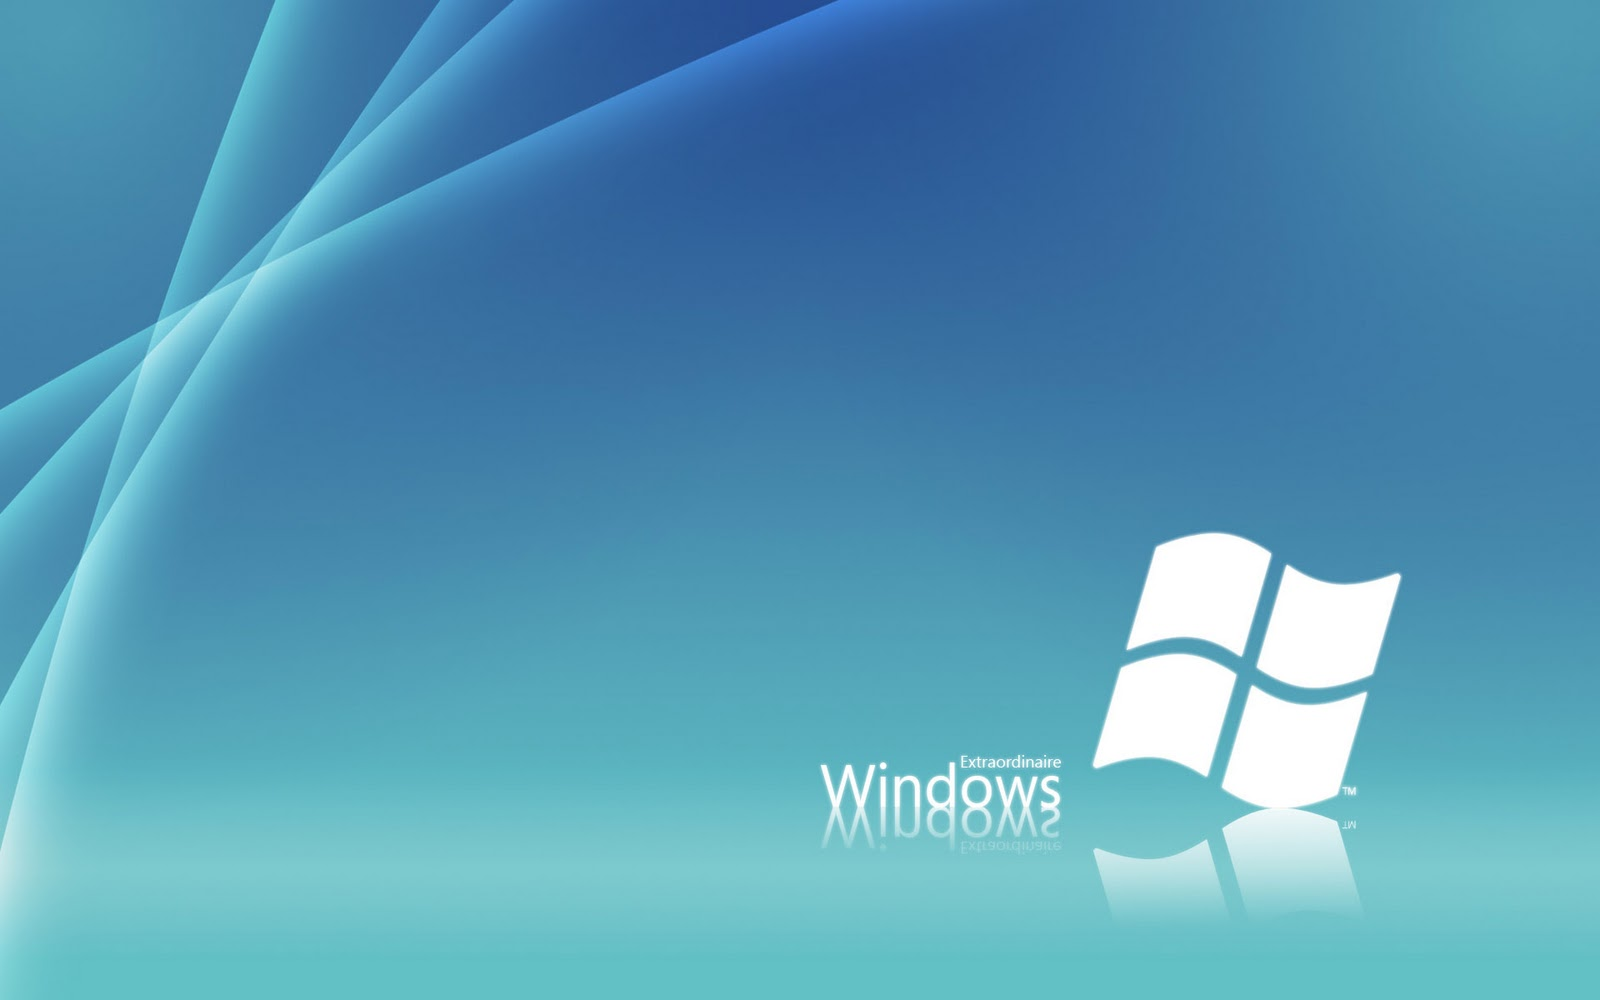 30 Wallpaper Keren Untuk Windows 7